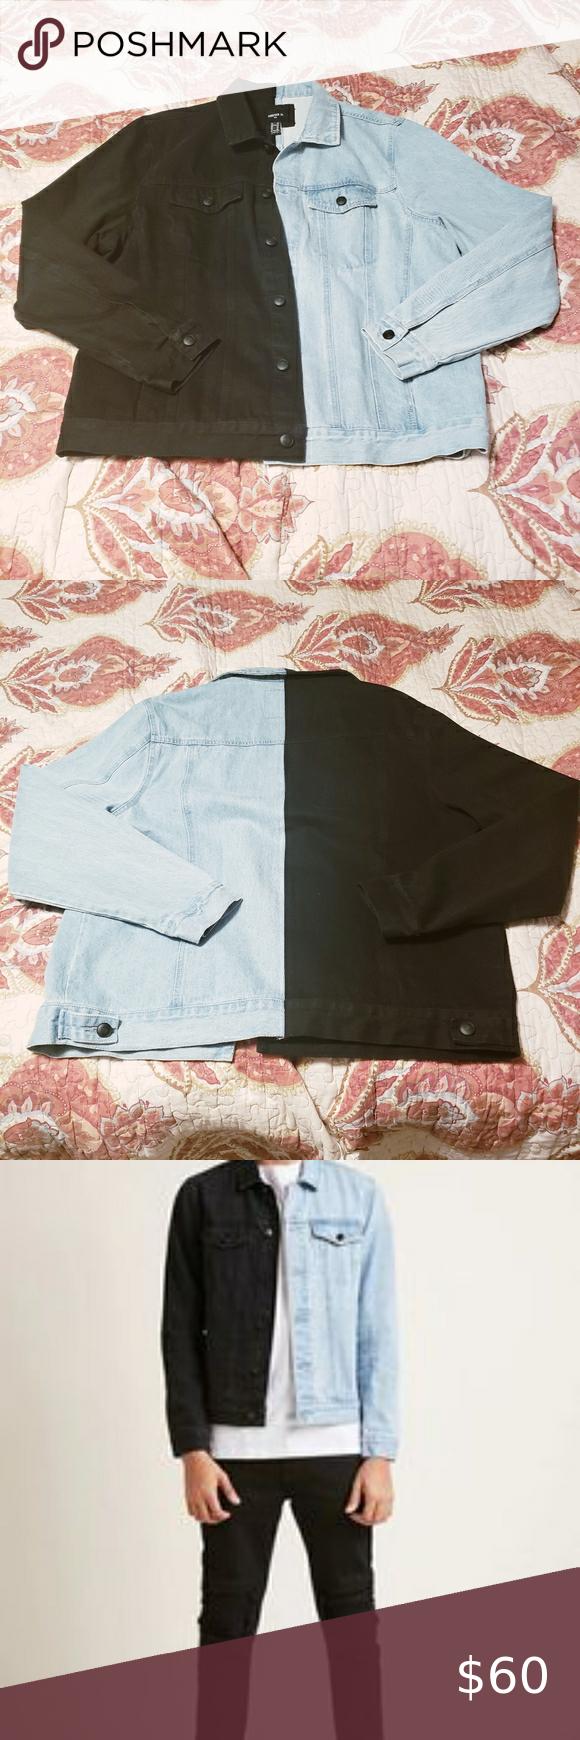 Final Sale Light Blue Half Black Denim Jacket Denim Jacket Dark Denim Jacket Black Denim Jacket [ 1740 x 580 Pixel ]